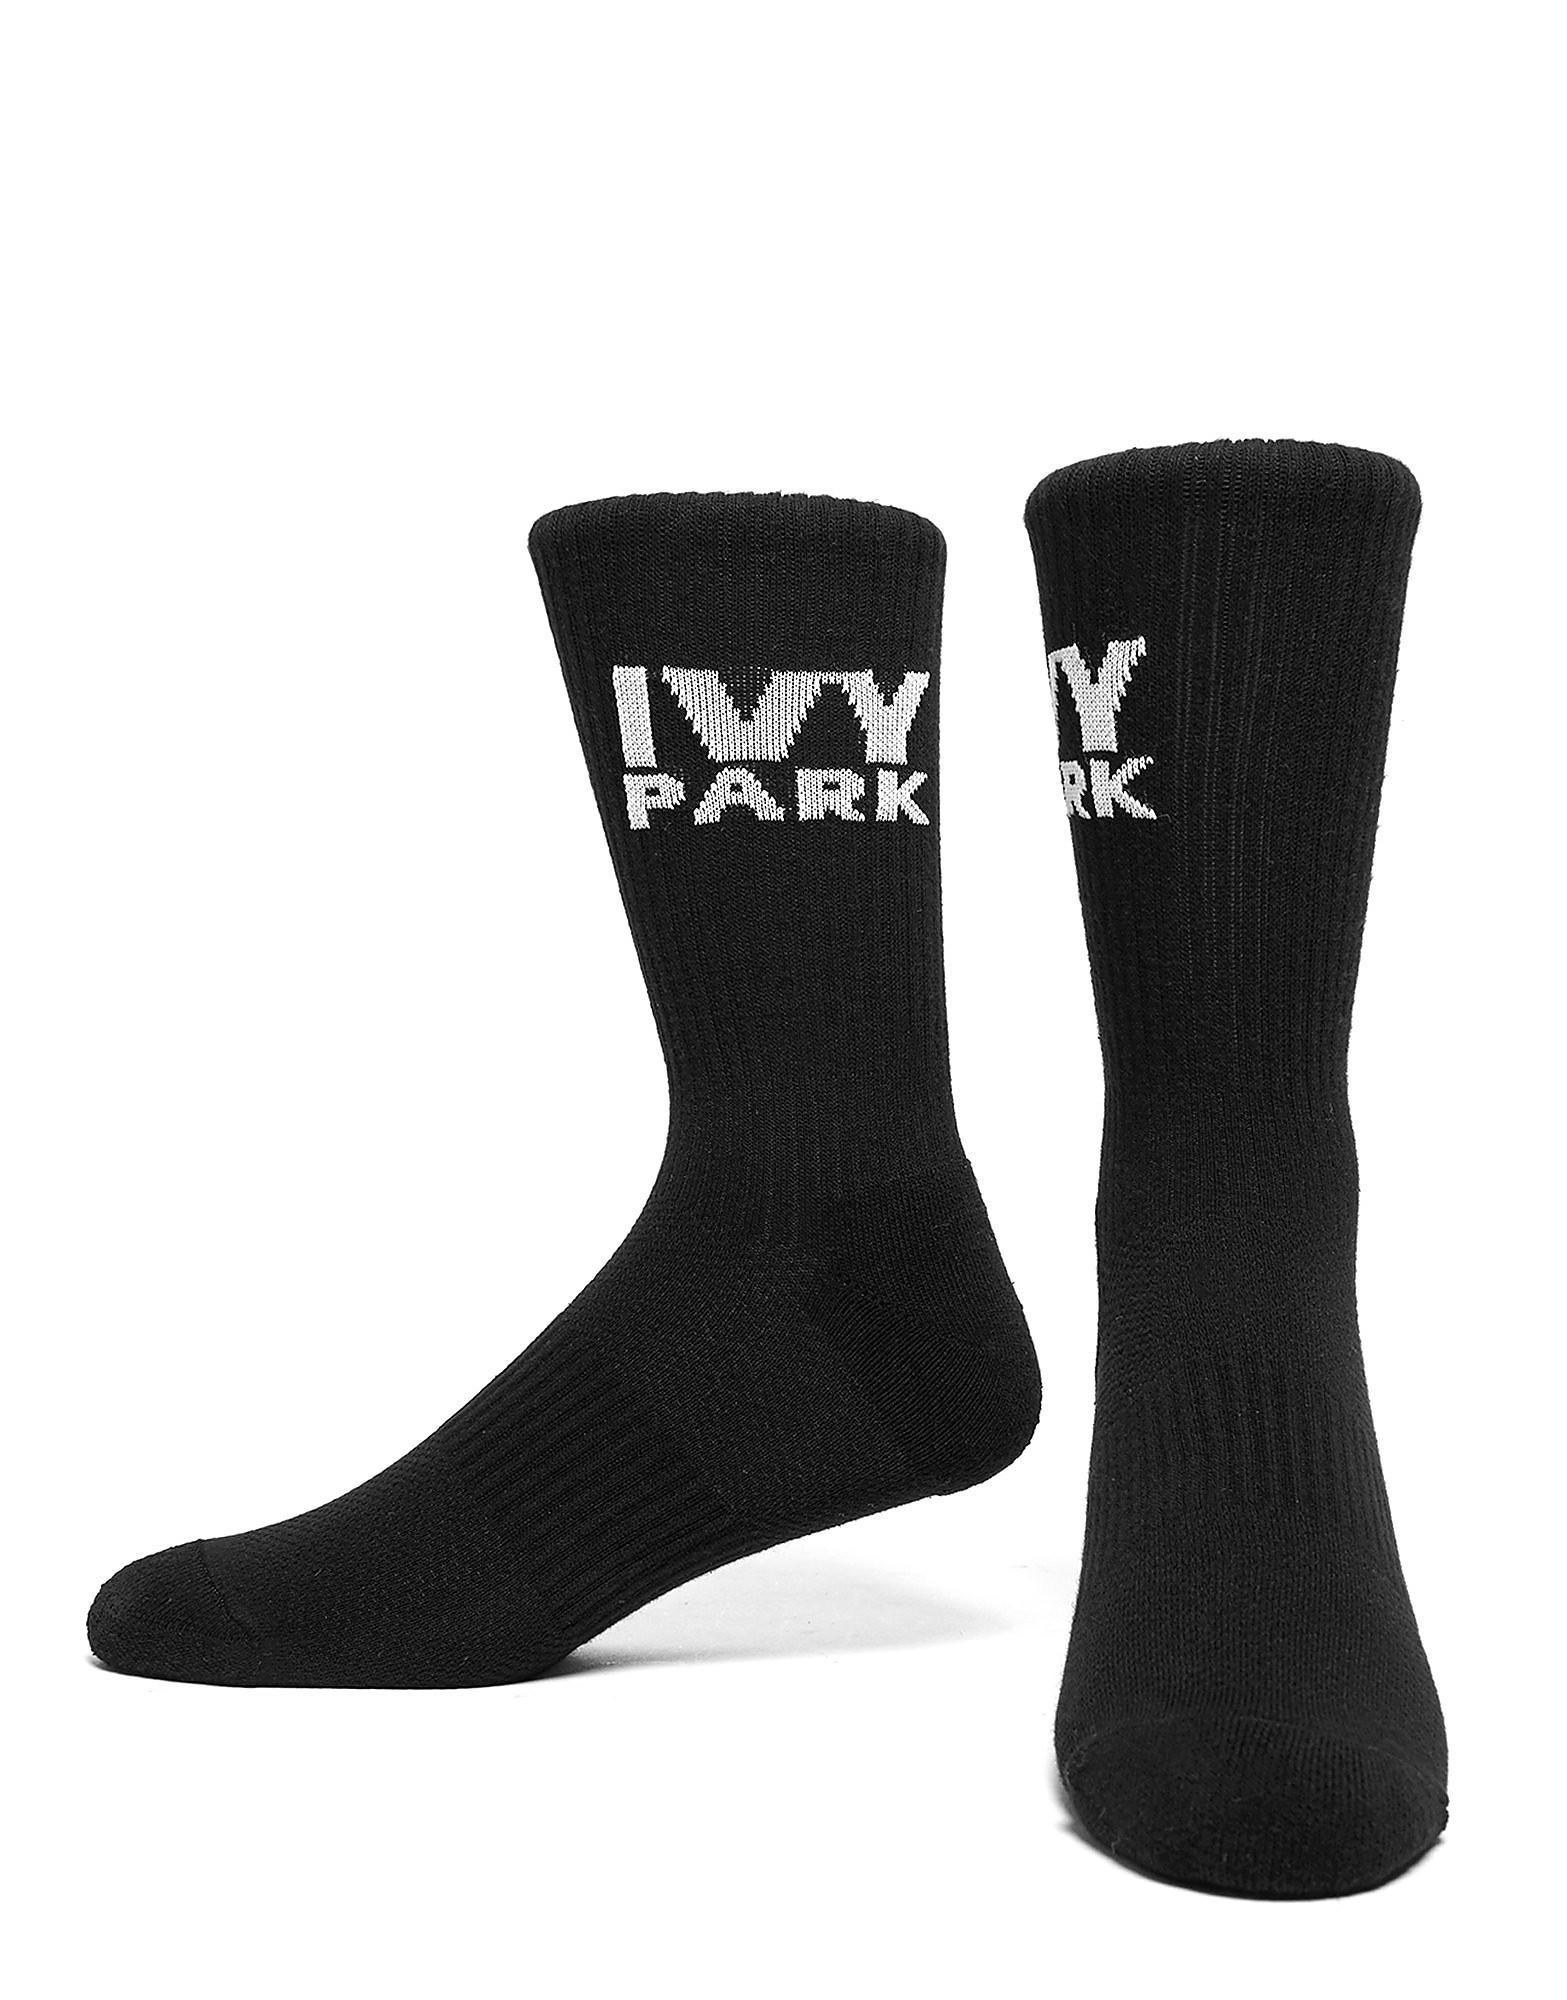 IVY PARK 2 Pack Socks